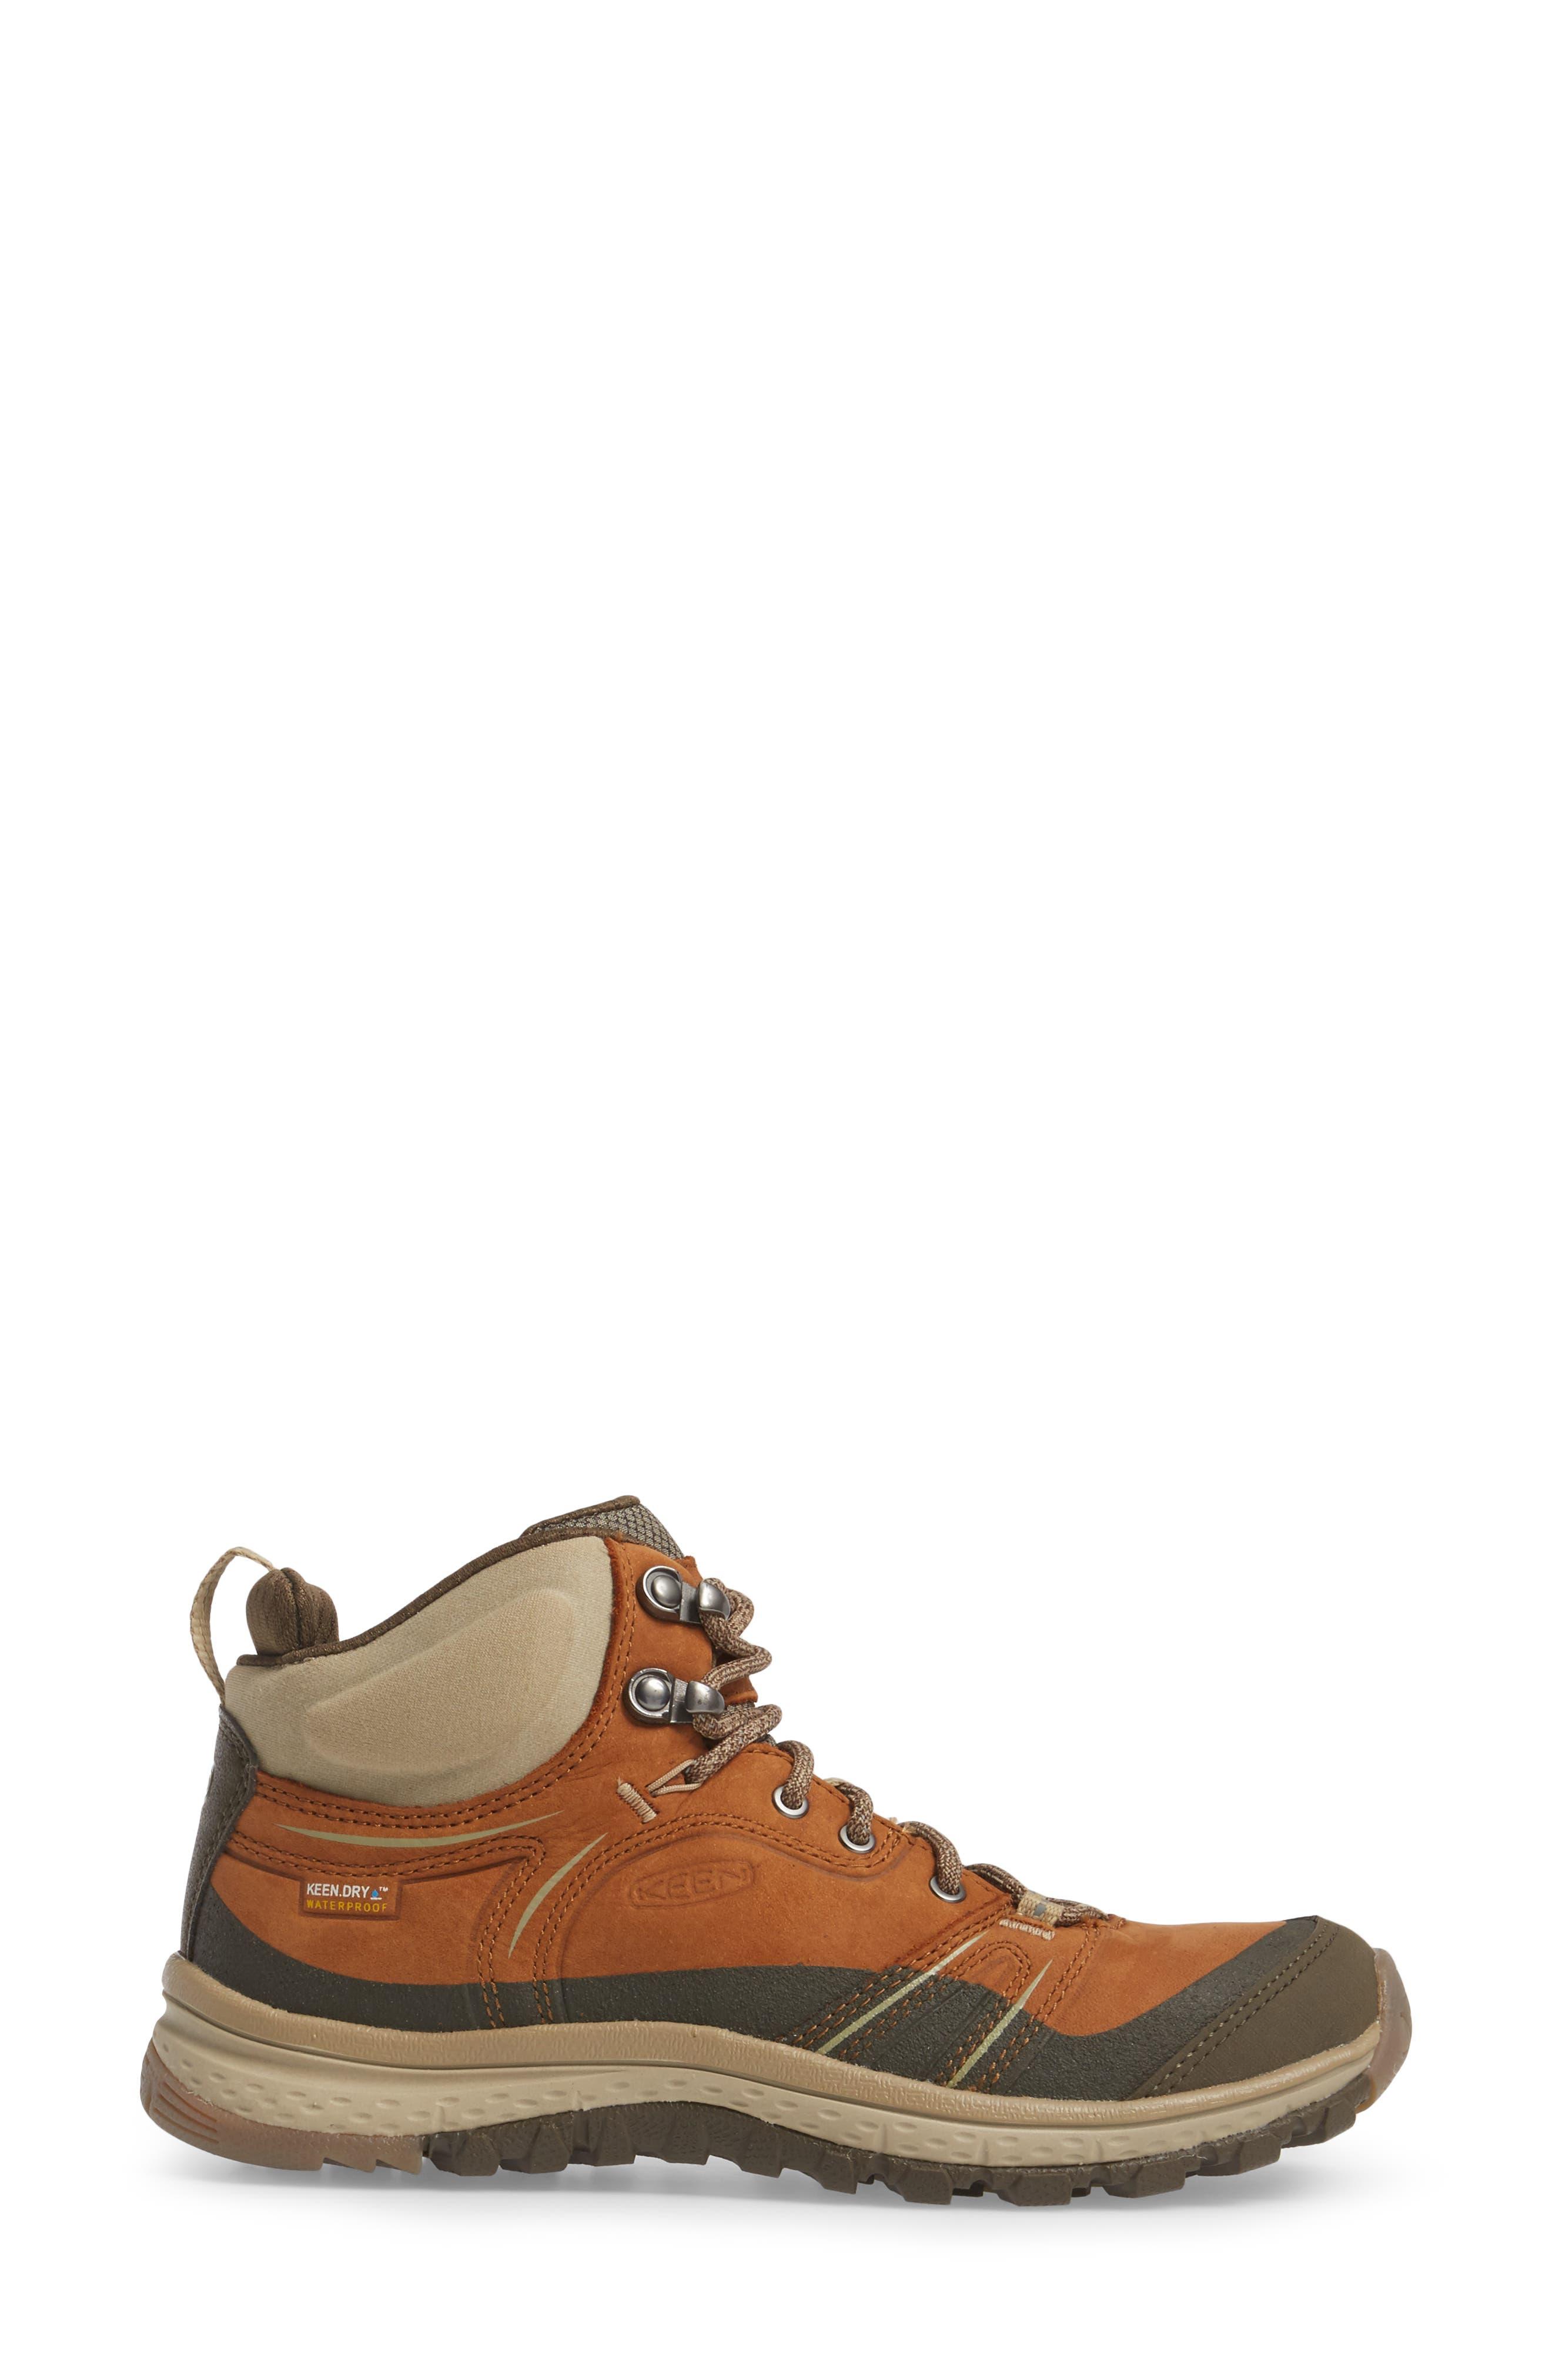 Terradora Leather Waterproof Hiking Boot,                             Alternate thumbnail 3, color,                             TIMBER/ ORANGE NUBUCK